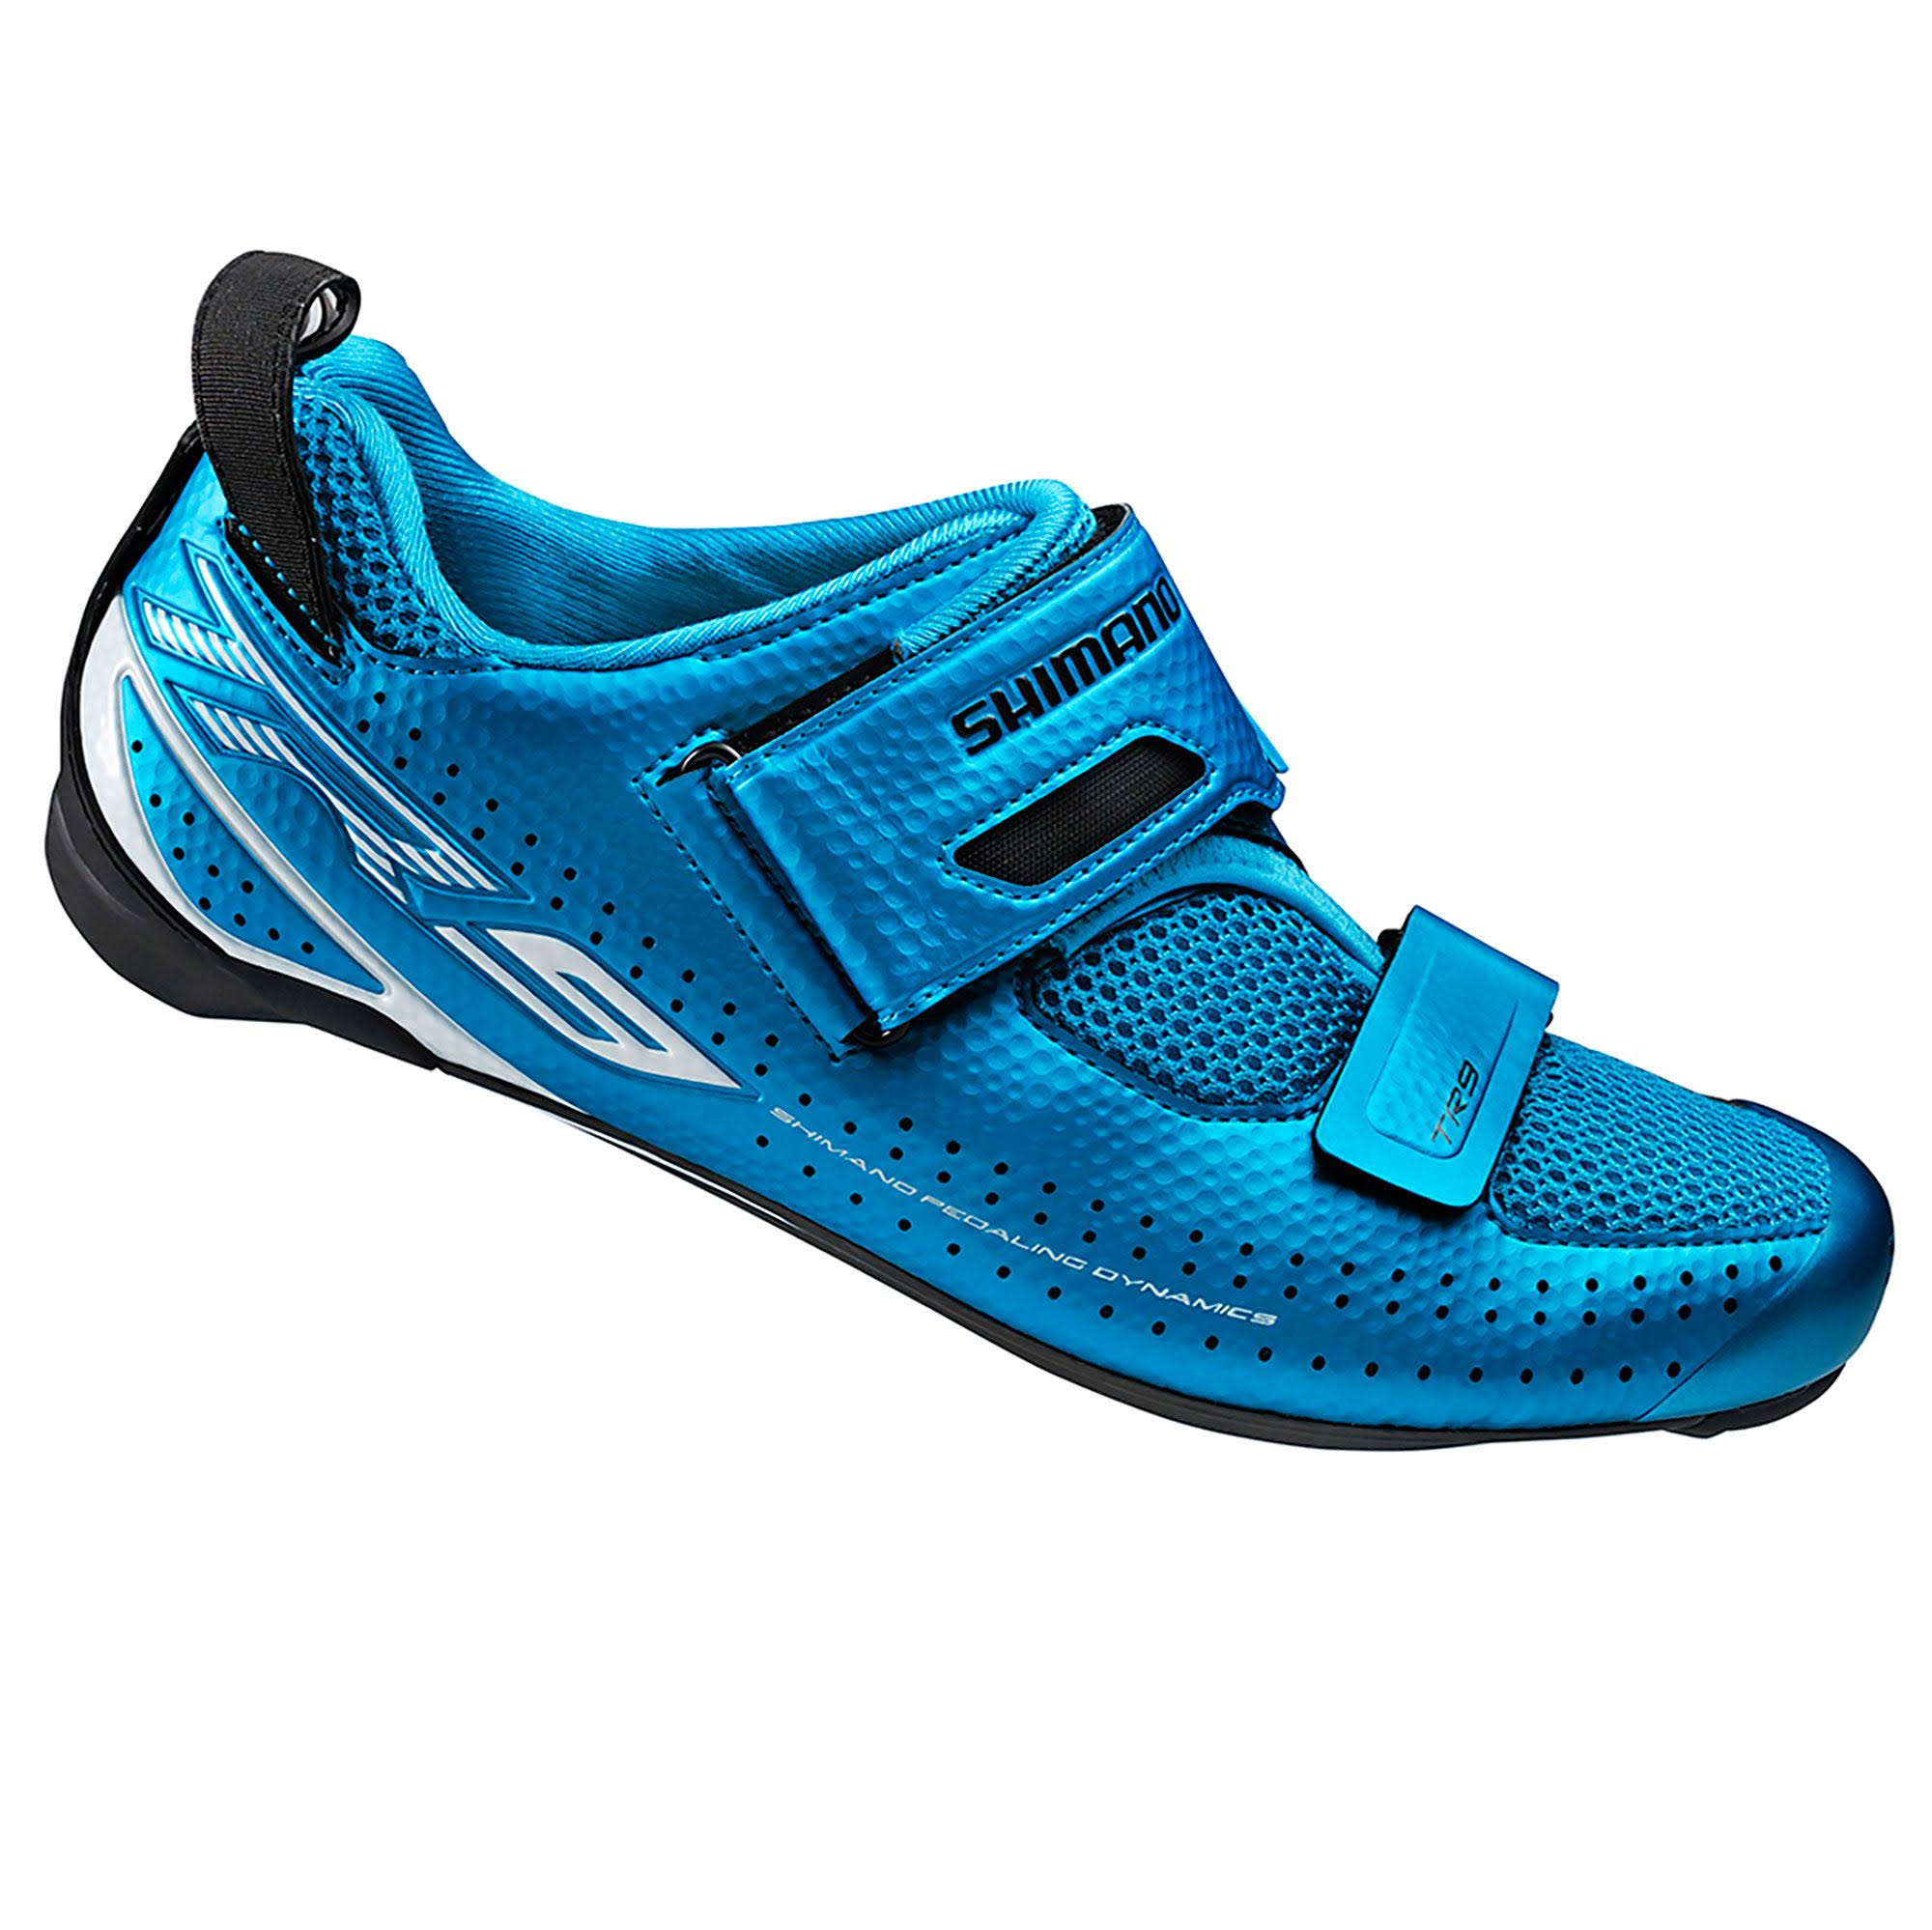 Shimano TR9 SPD-SL Shoes 49 / Blue